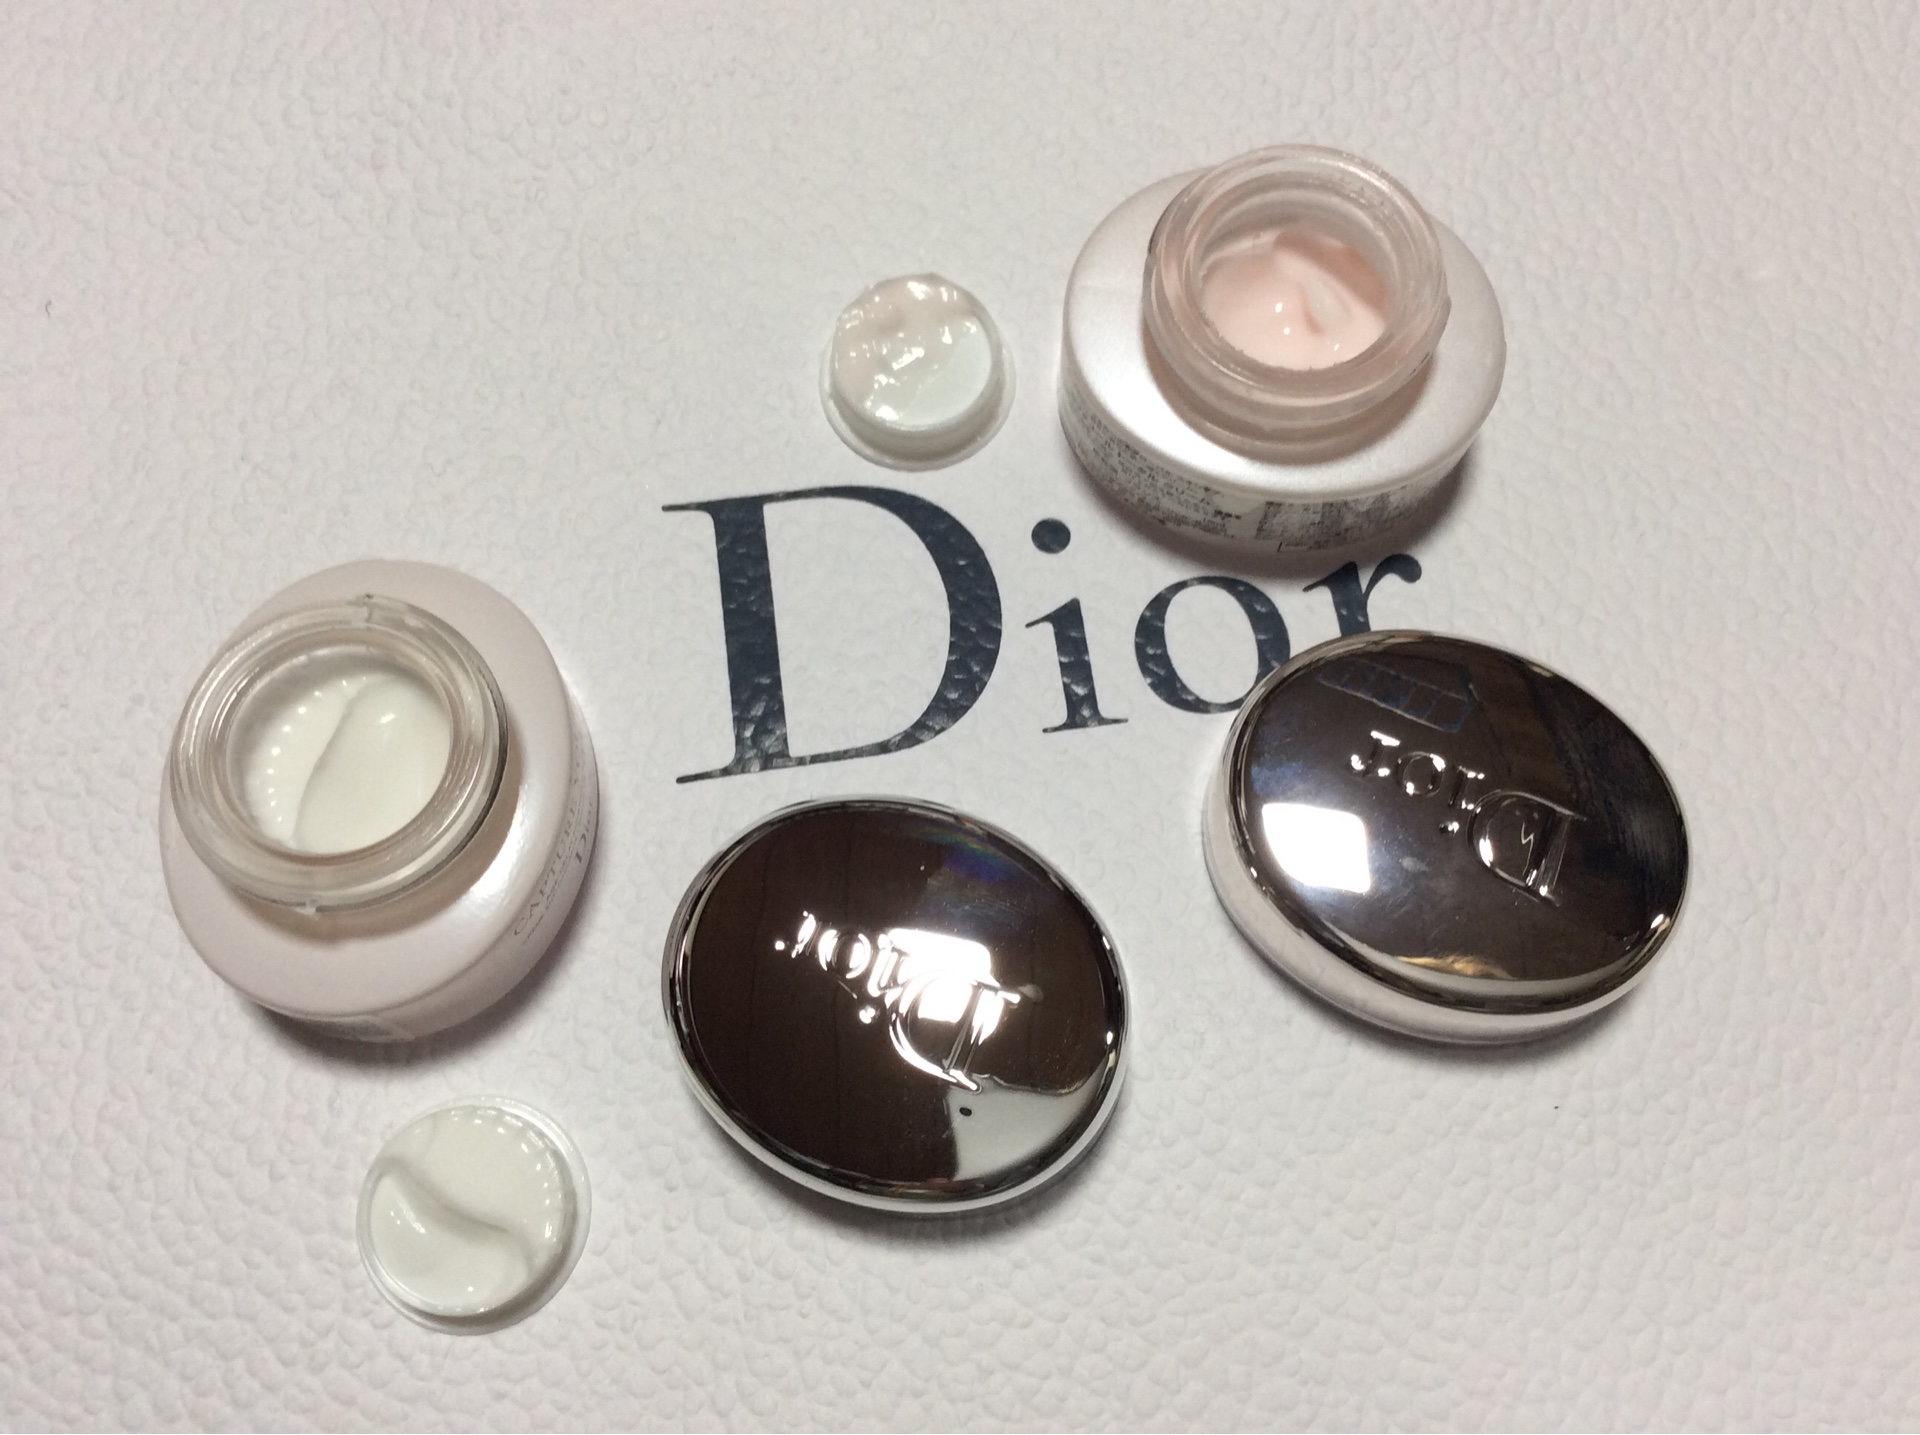 Dior ディオール アドベントカレンダー カプチュールトータル カプチュールユース クリーム